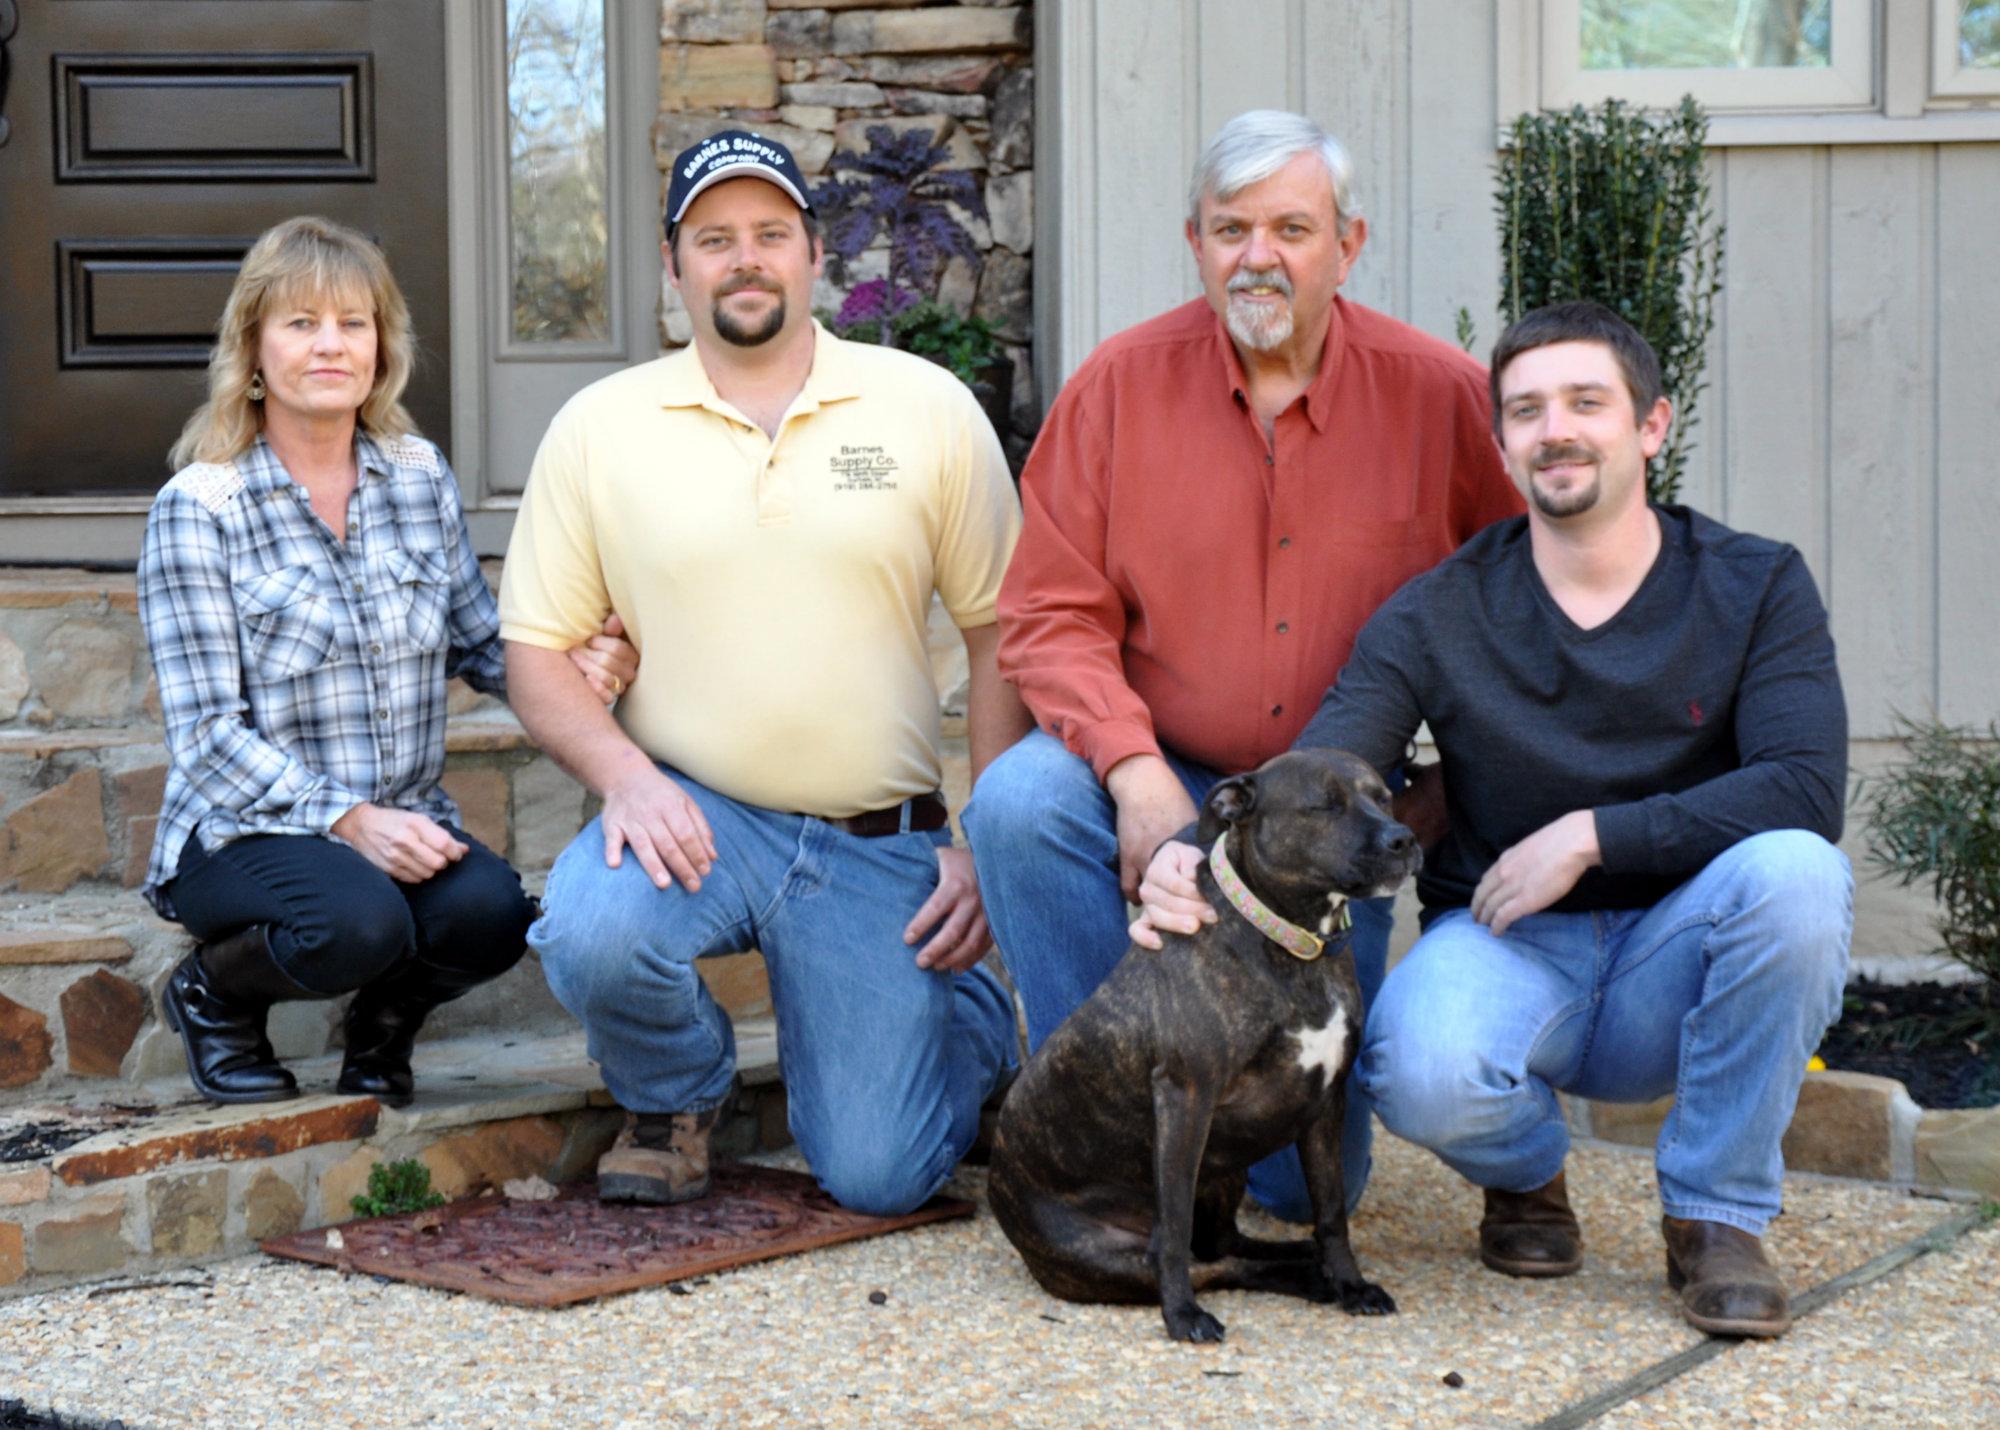 Barnes-Supply-Durham-Family-Photo.jpg